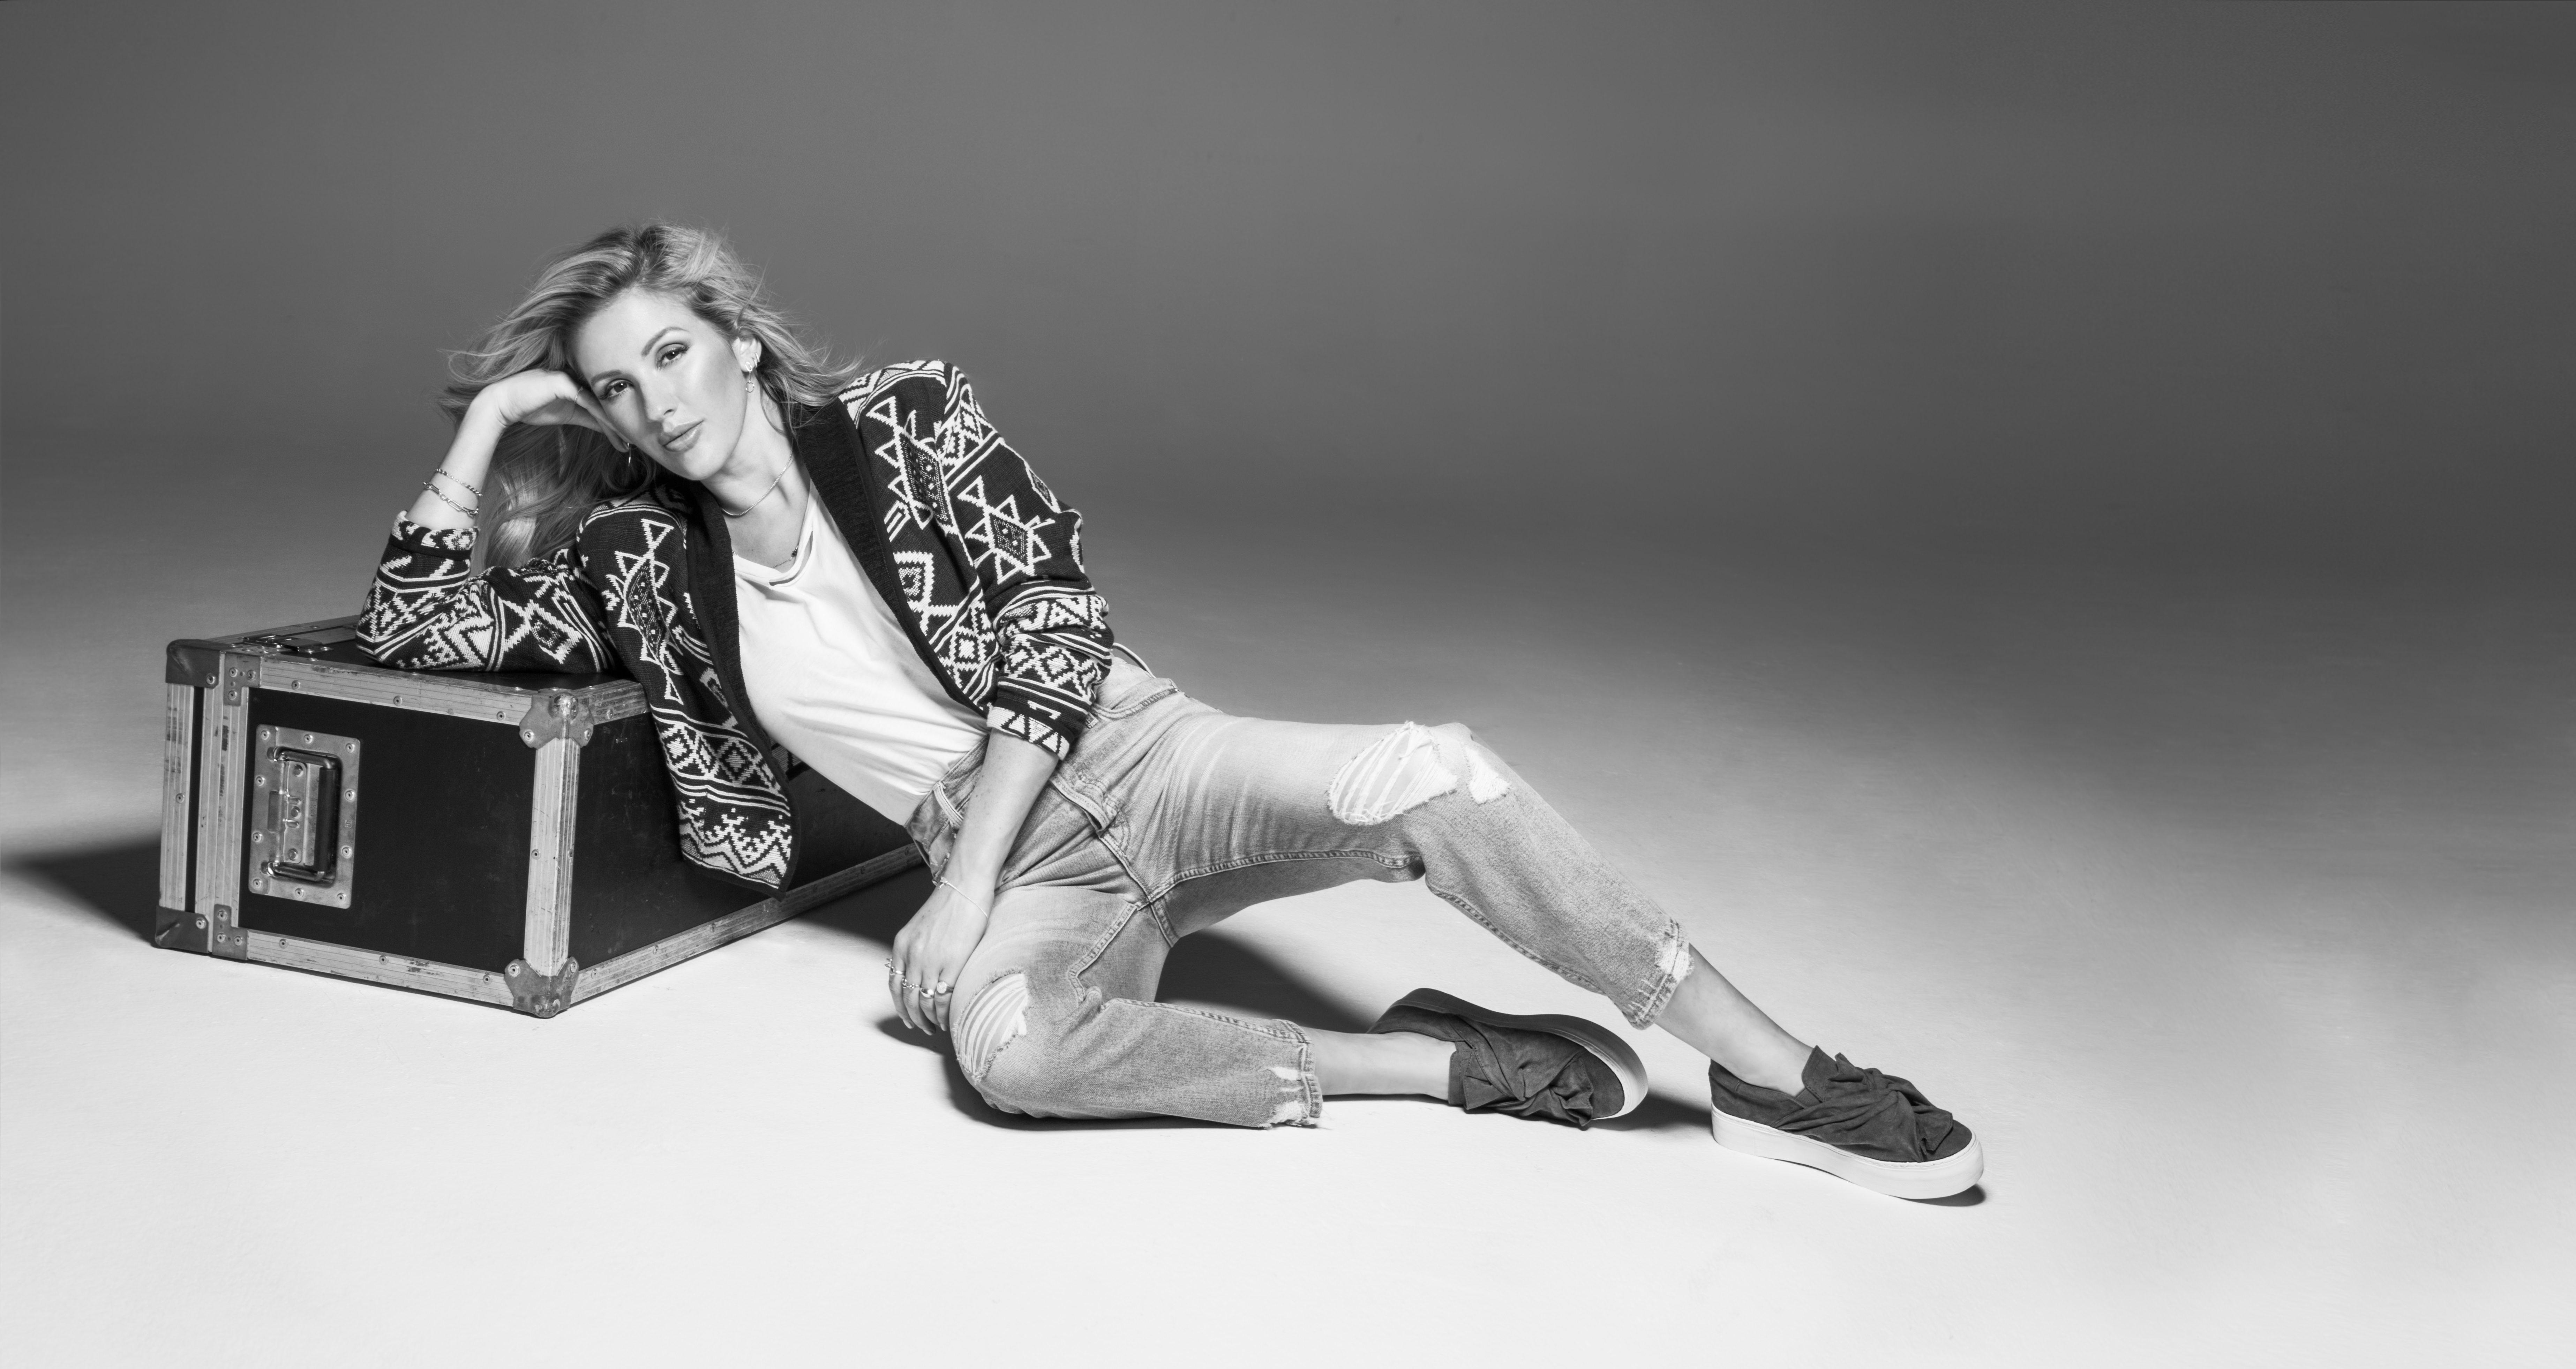 Ellie Goulding Wallpaper photo 19